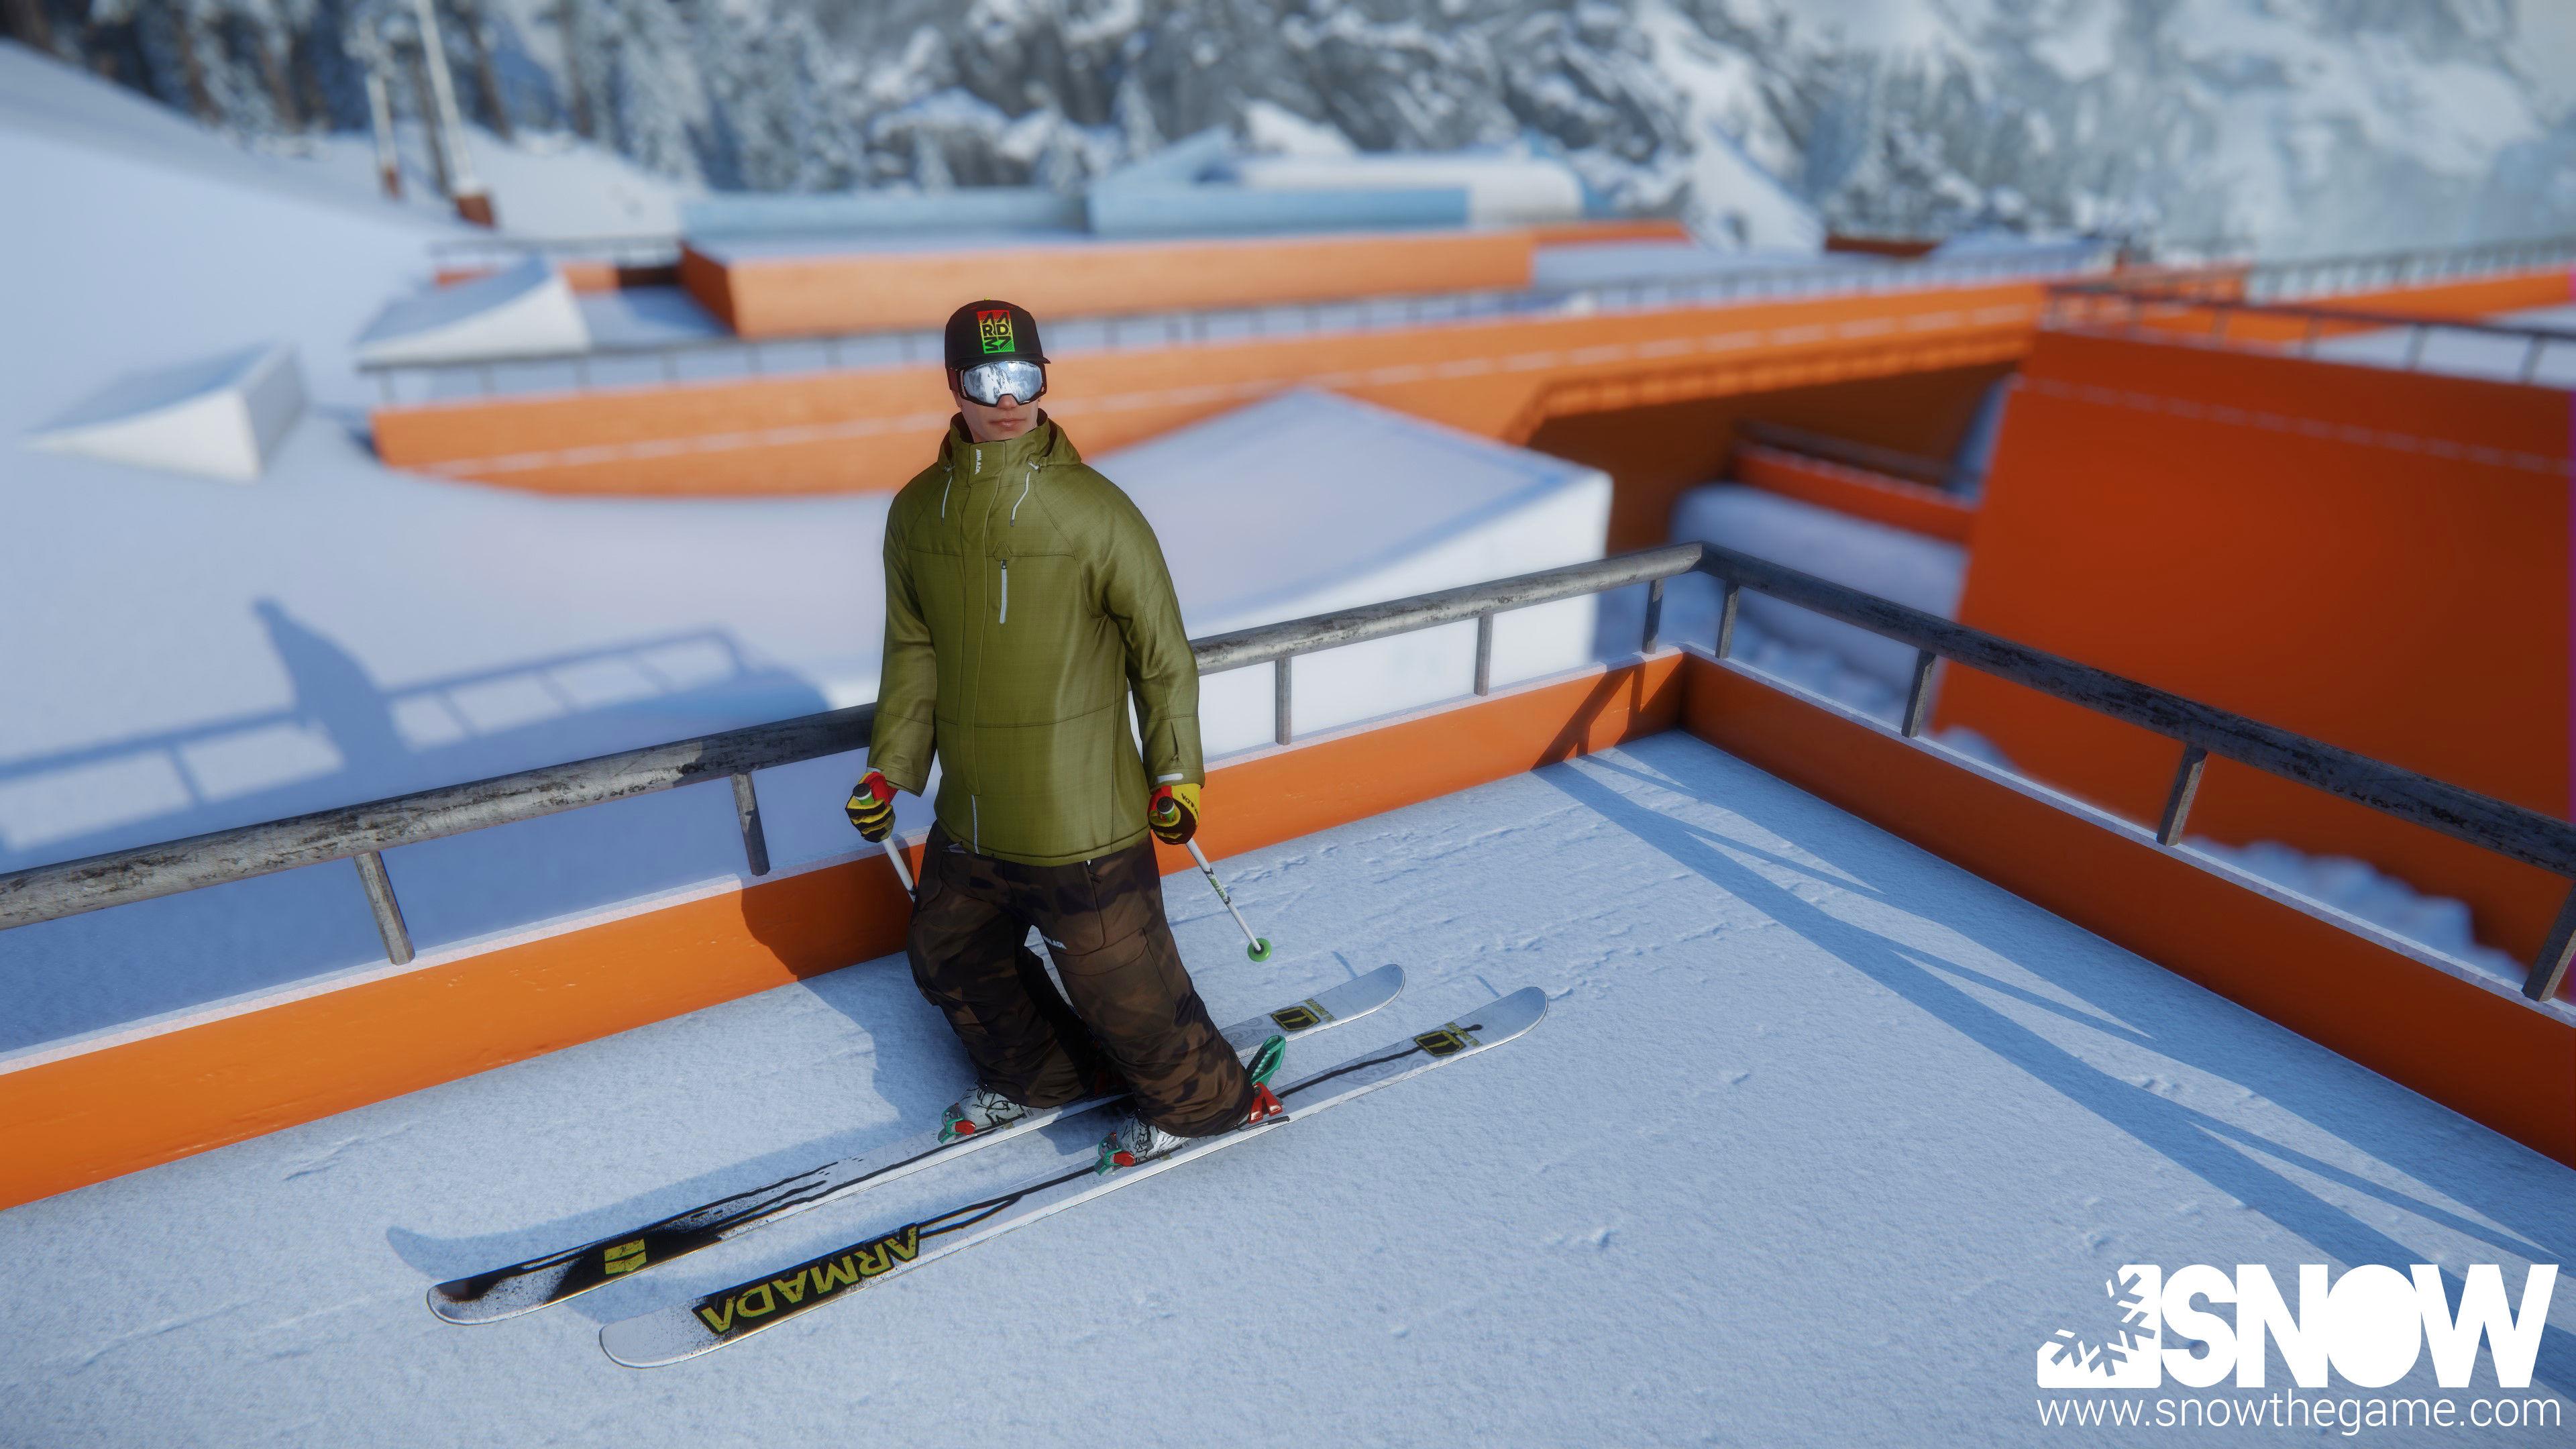 Nové obrázky z adrenalinového SNOW 88122